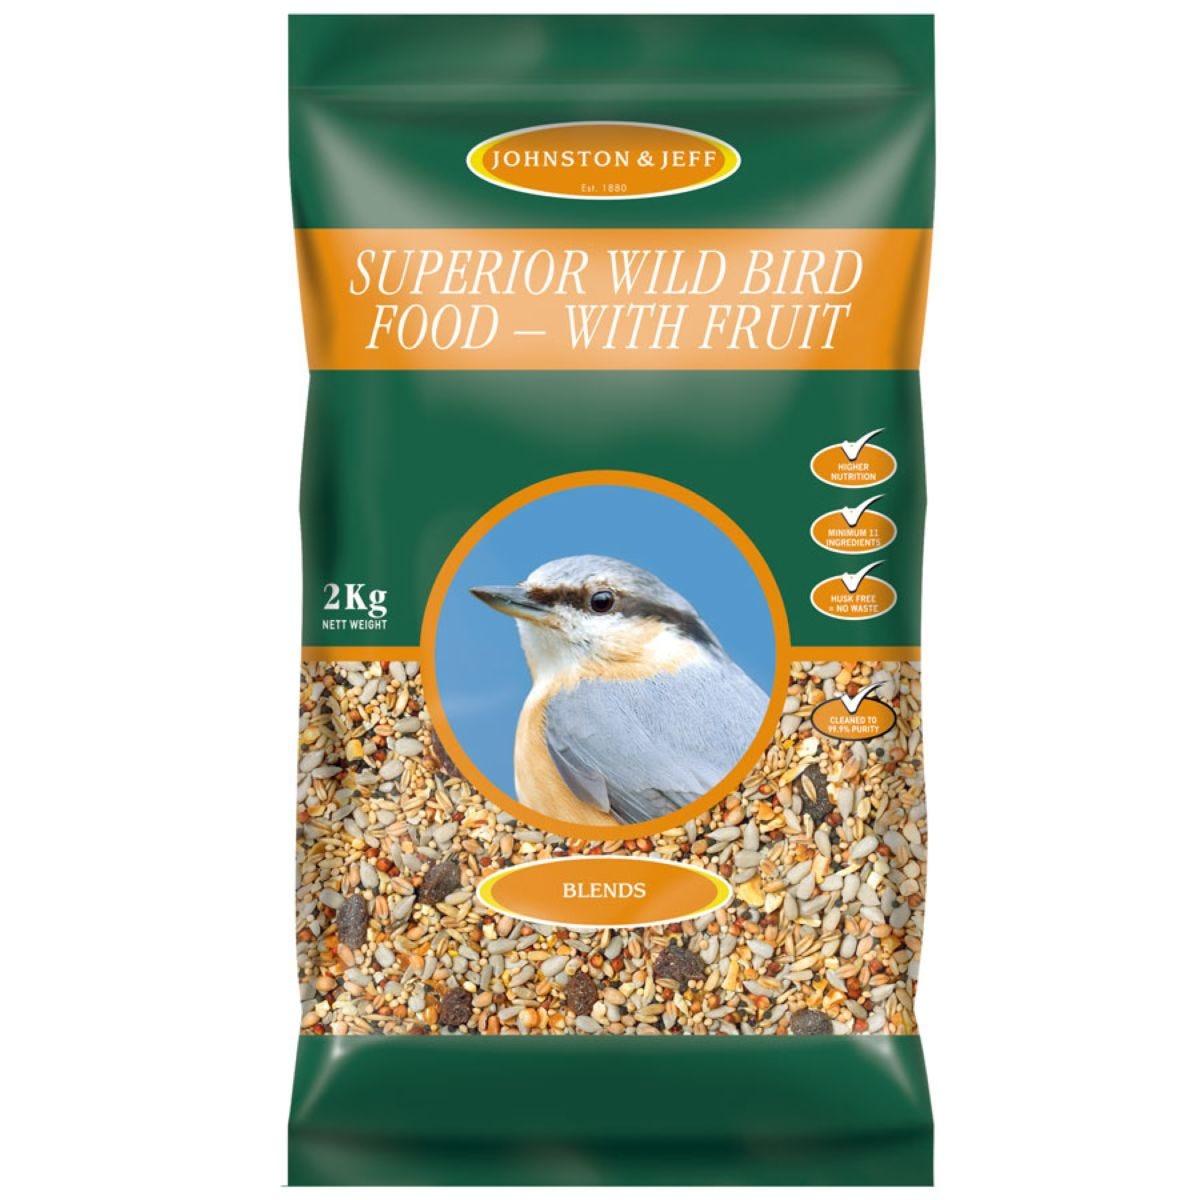 Johnston & Jeff Superior Wild Bird Food with Fruit - 2kg